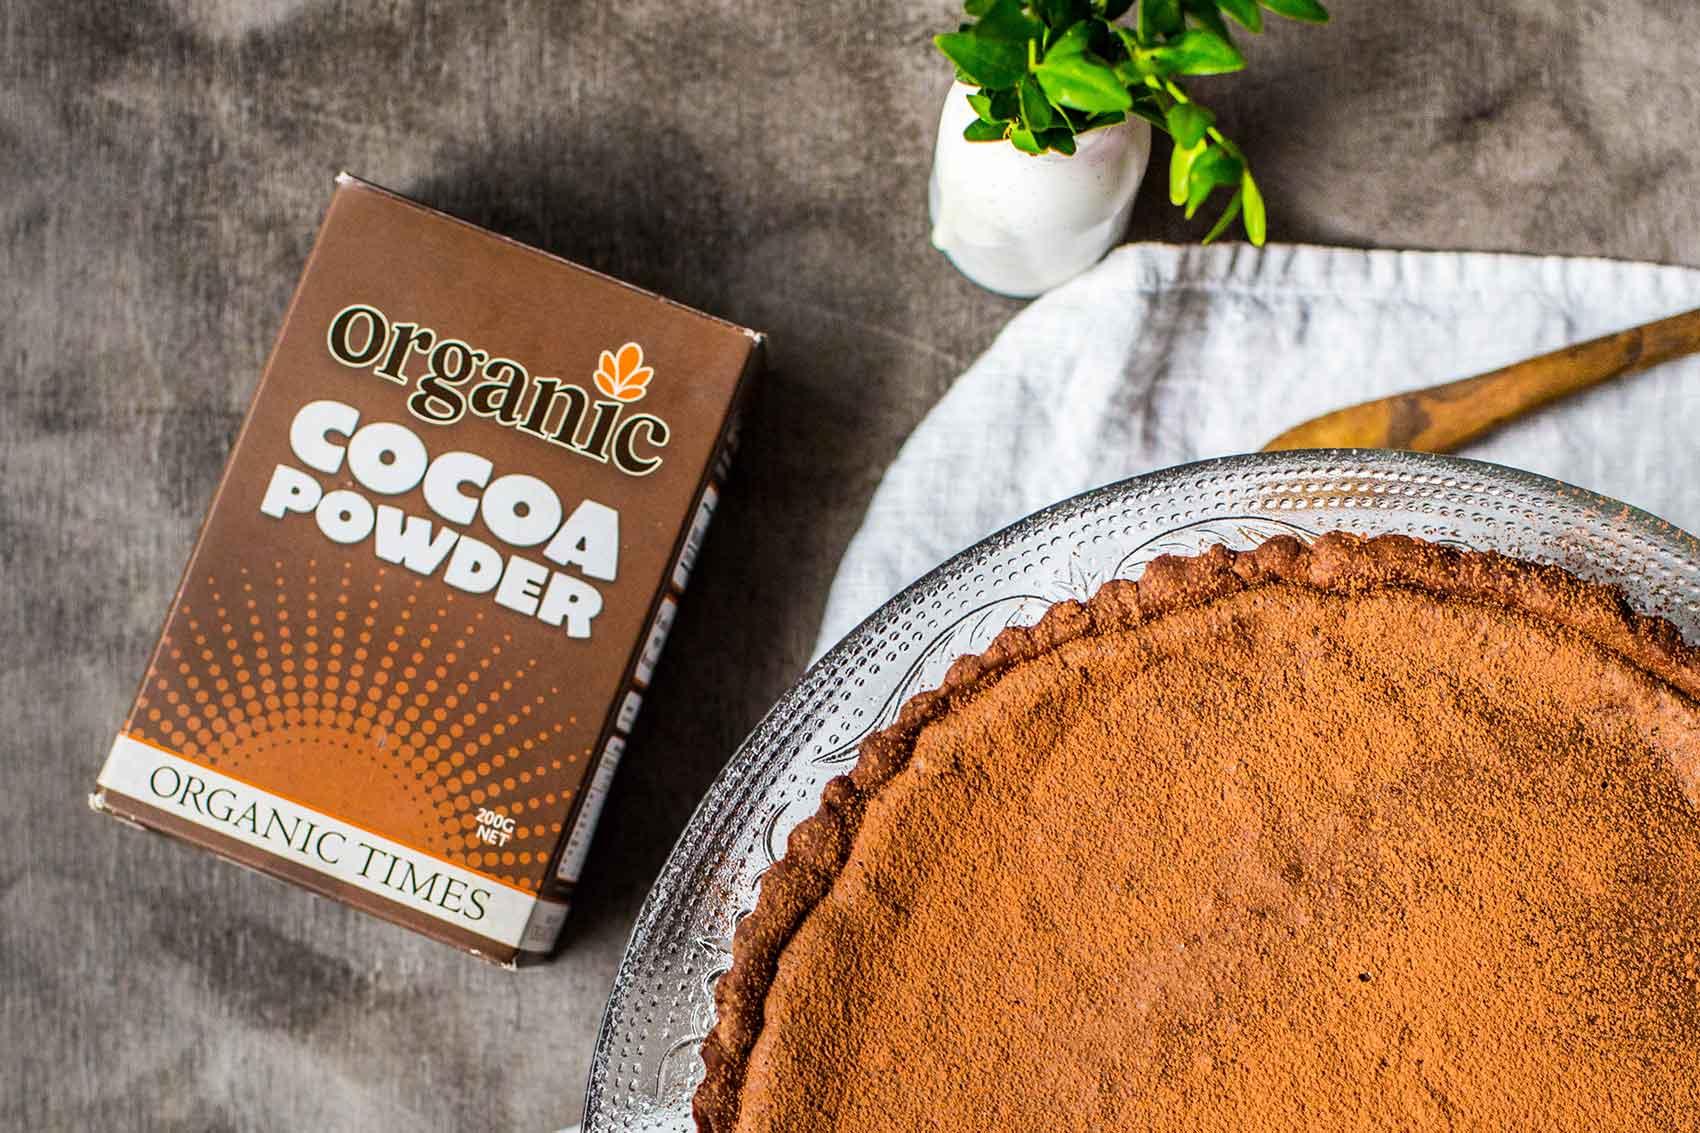 Organic Times Cocoa Powder next to a chocolate tart